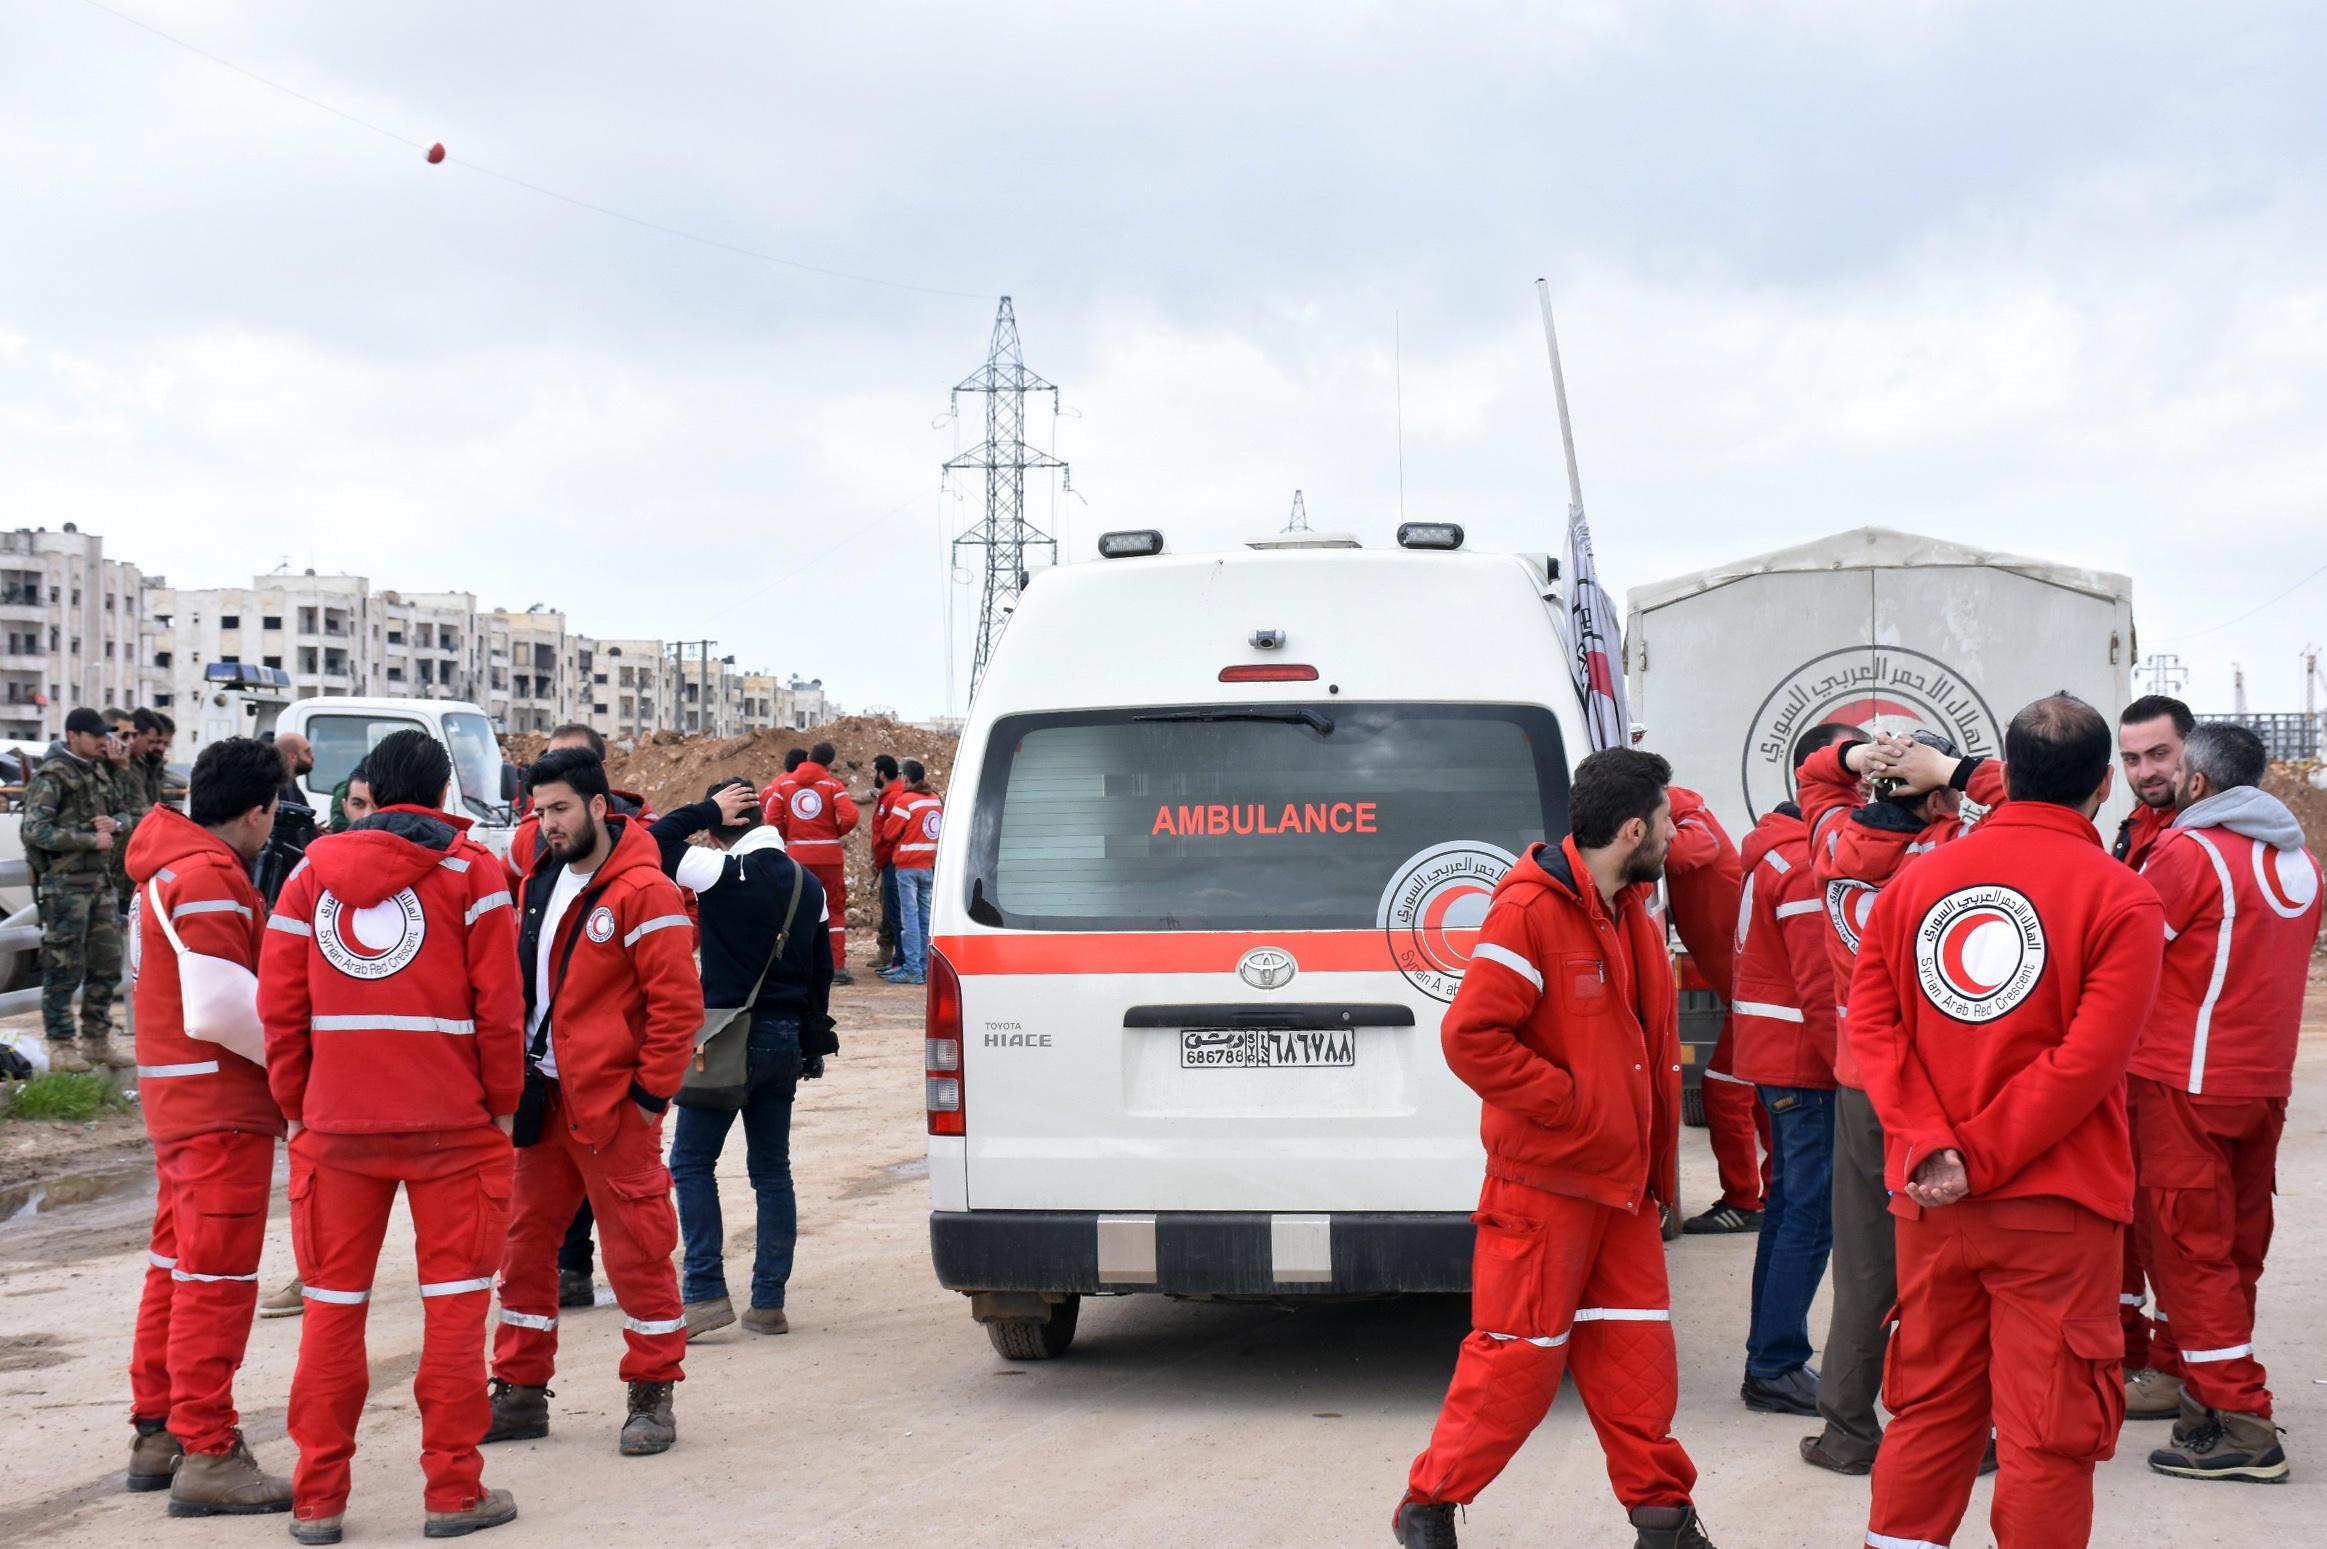 Dozens killed in blast near evacuation buses, Syria TV claims